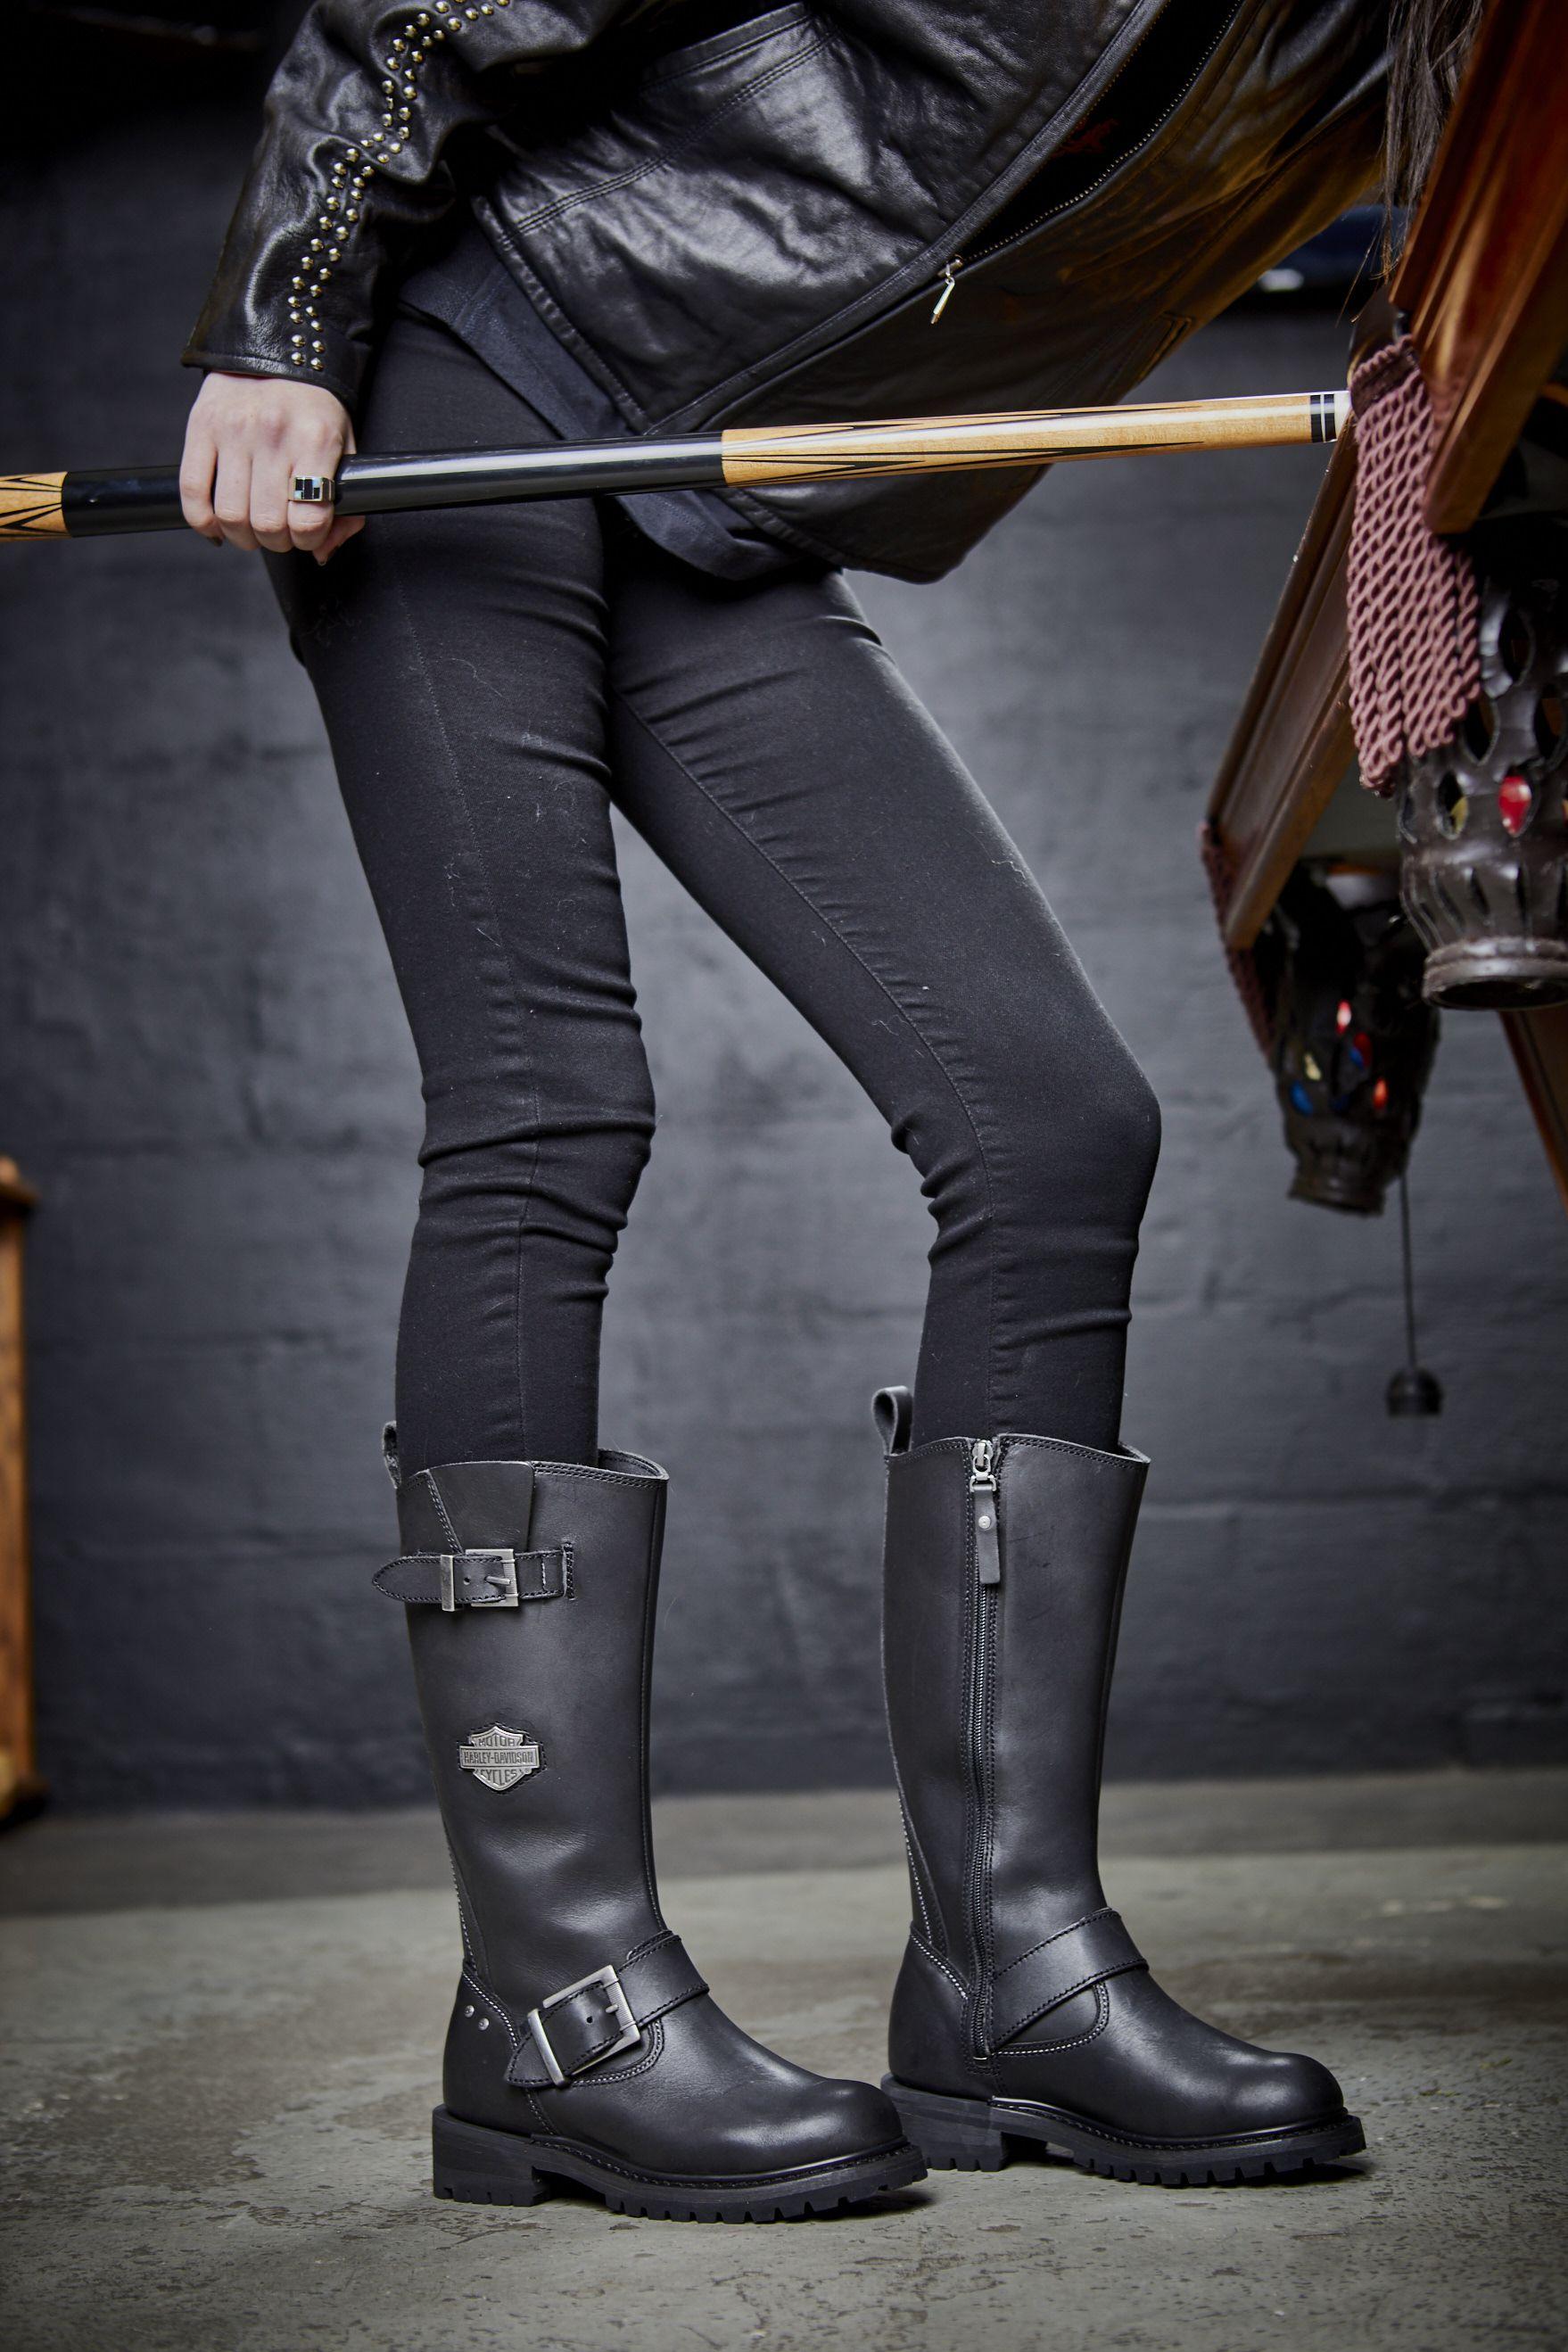 b287ba19fdd2 Women s Chalmers Boot Harley Davidson Dealership